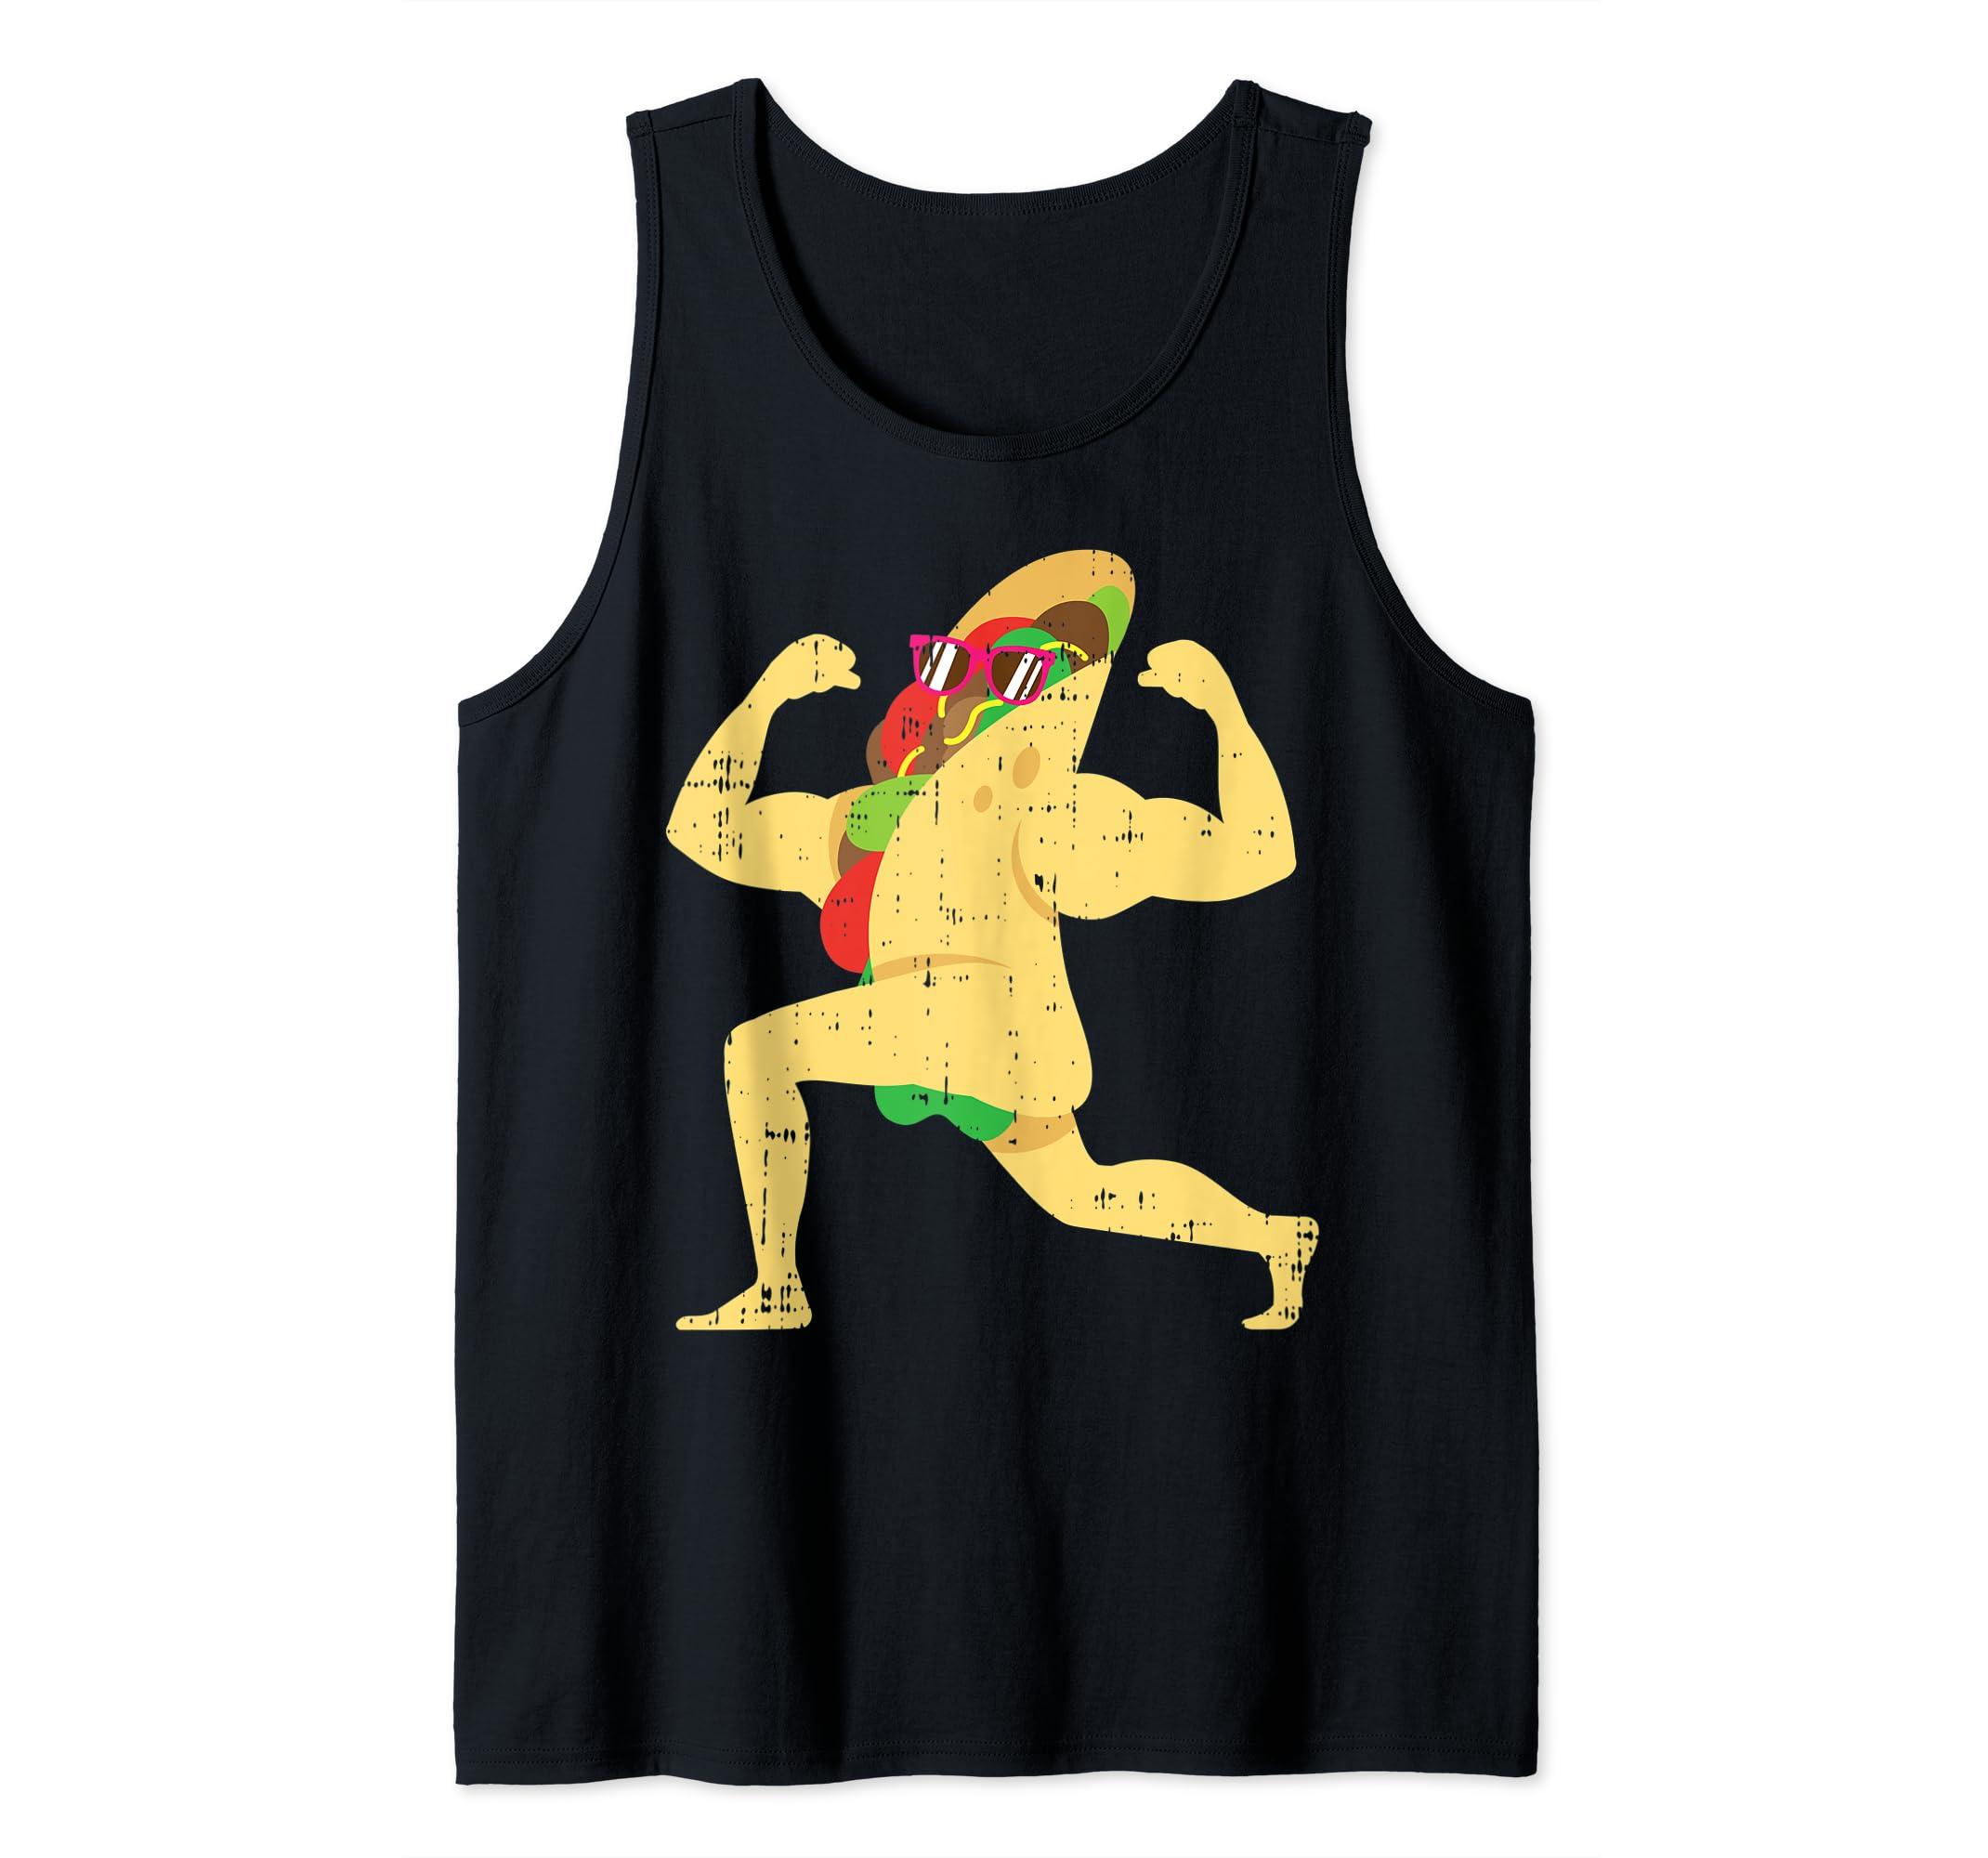 835c5d77 Amazon.com: Muscle Beach Taco Funny Mexican Cinco De Mayo Tank Top: Clothing